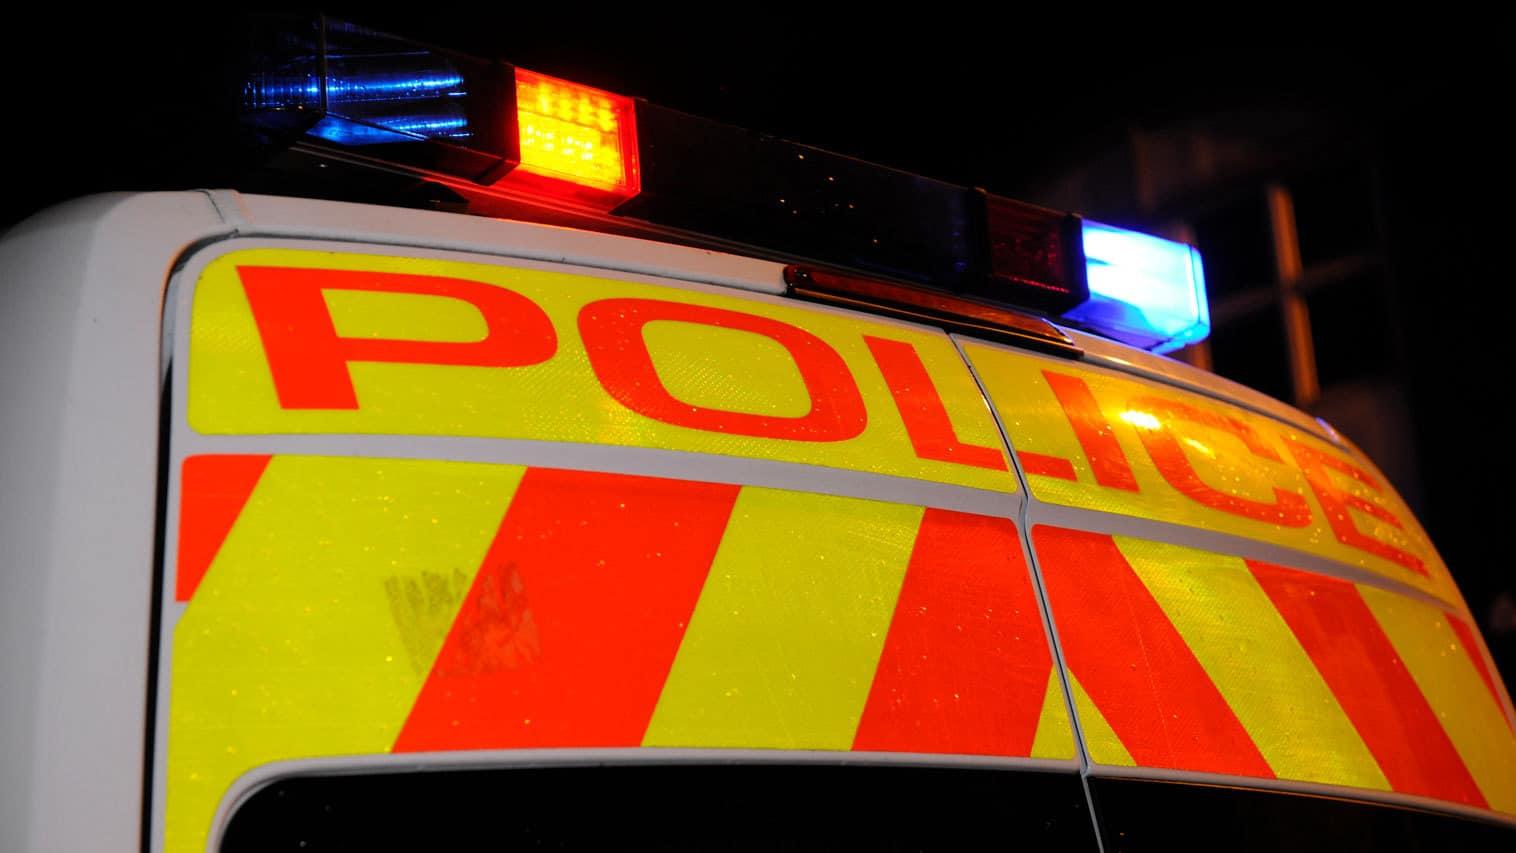 Man assaulted following incident on A303 near Cartgate services